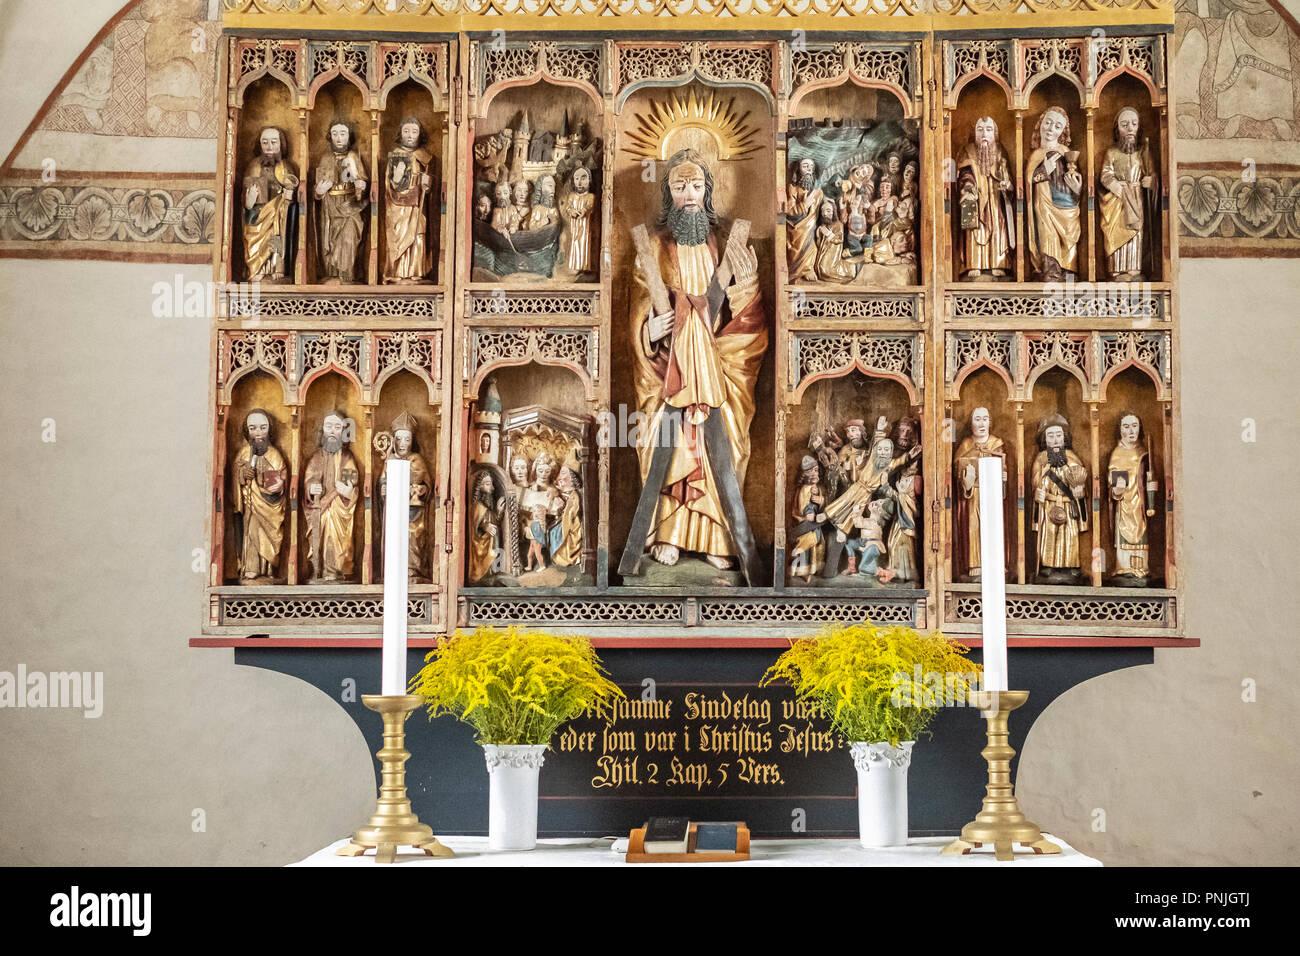 Der Altar der Kirche Keldby, Moen Island, Dänemark, Skandinavien, Europa. Stockbild